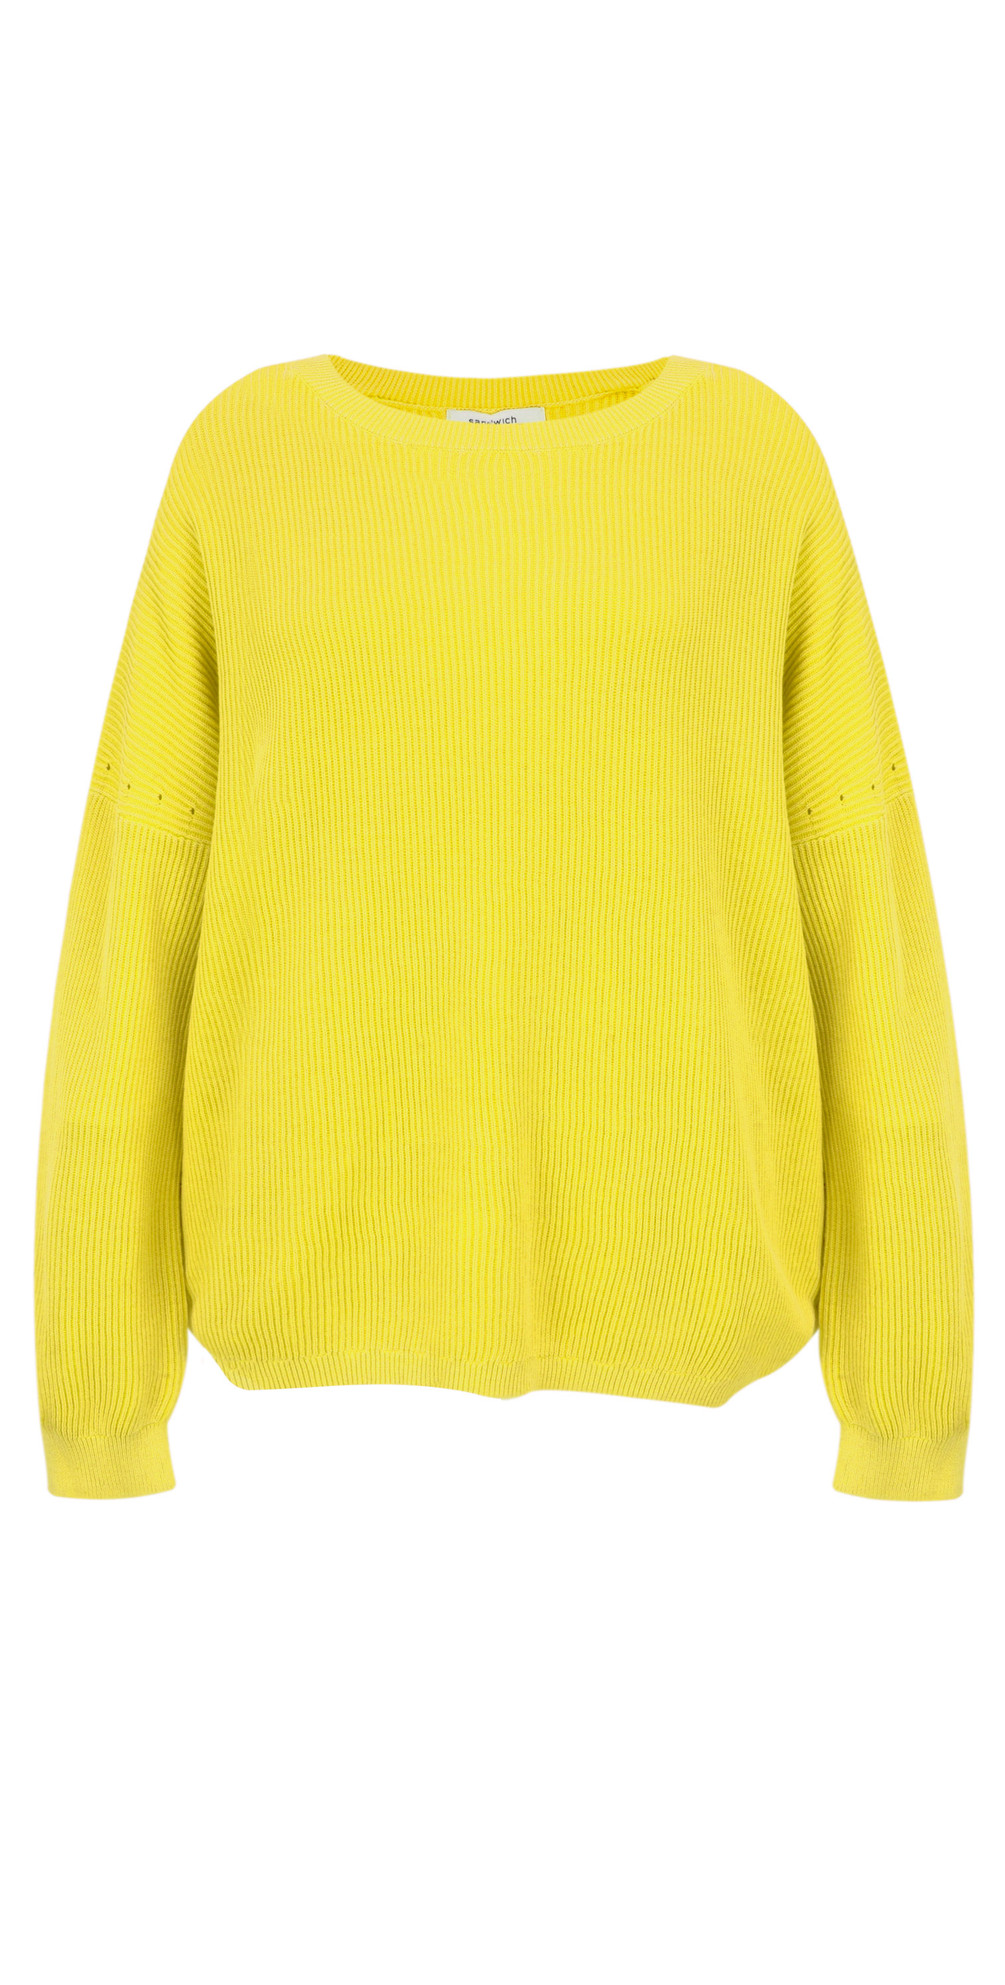 d18b82f6046eef Sandwich Clothing Batwing Rib Knit Jumper in Warm Yellow